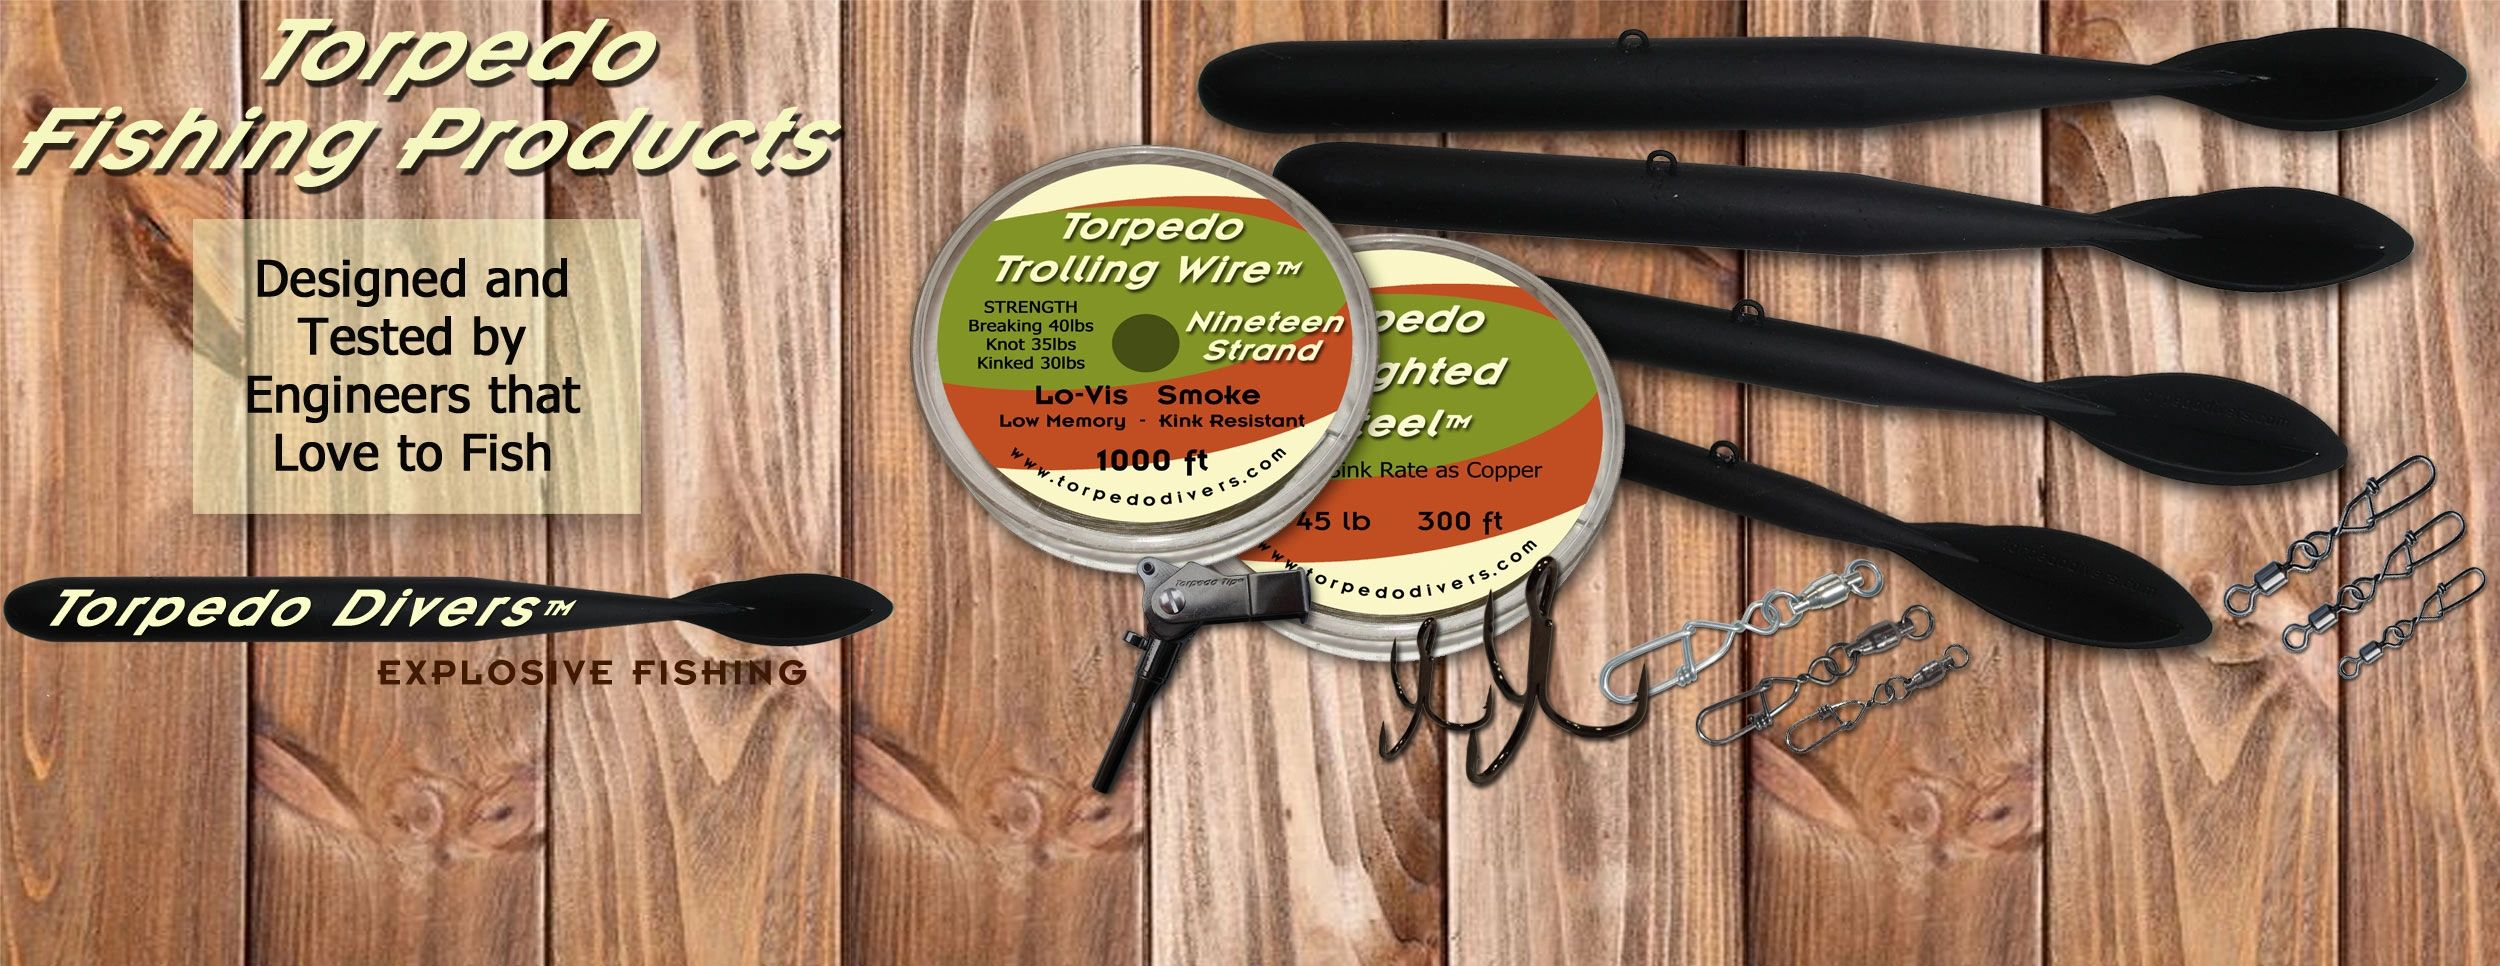 torpedofishingproducts